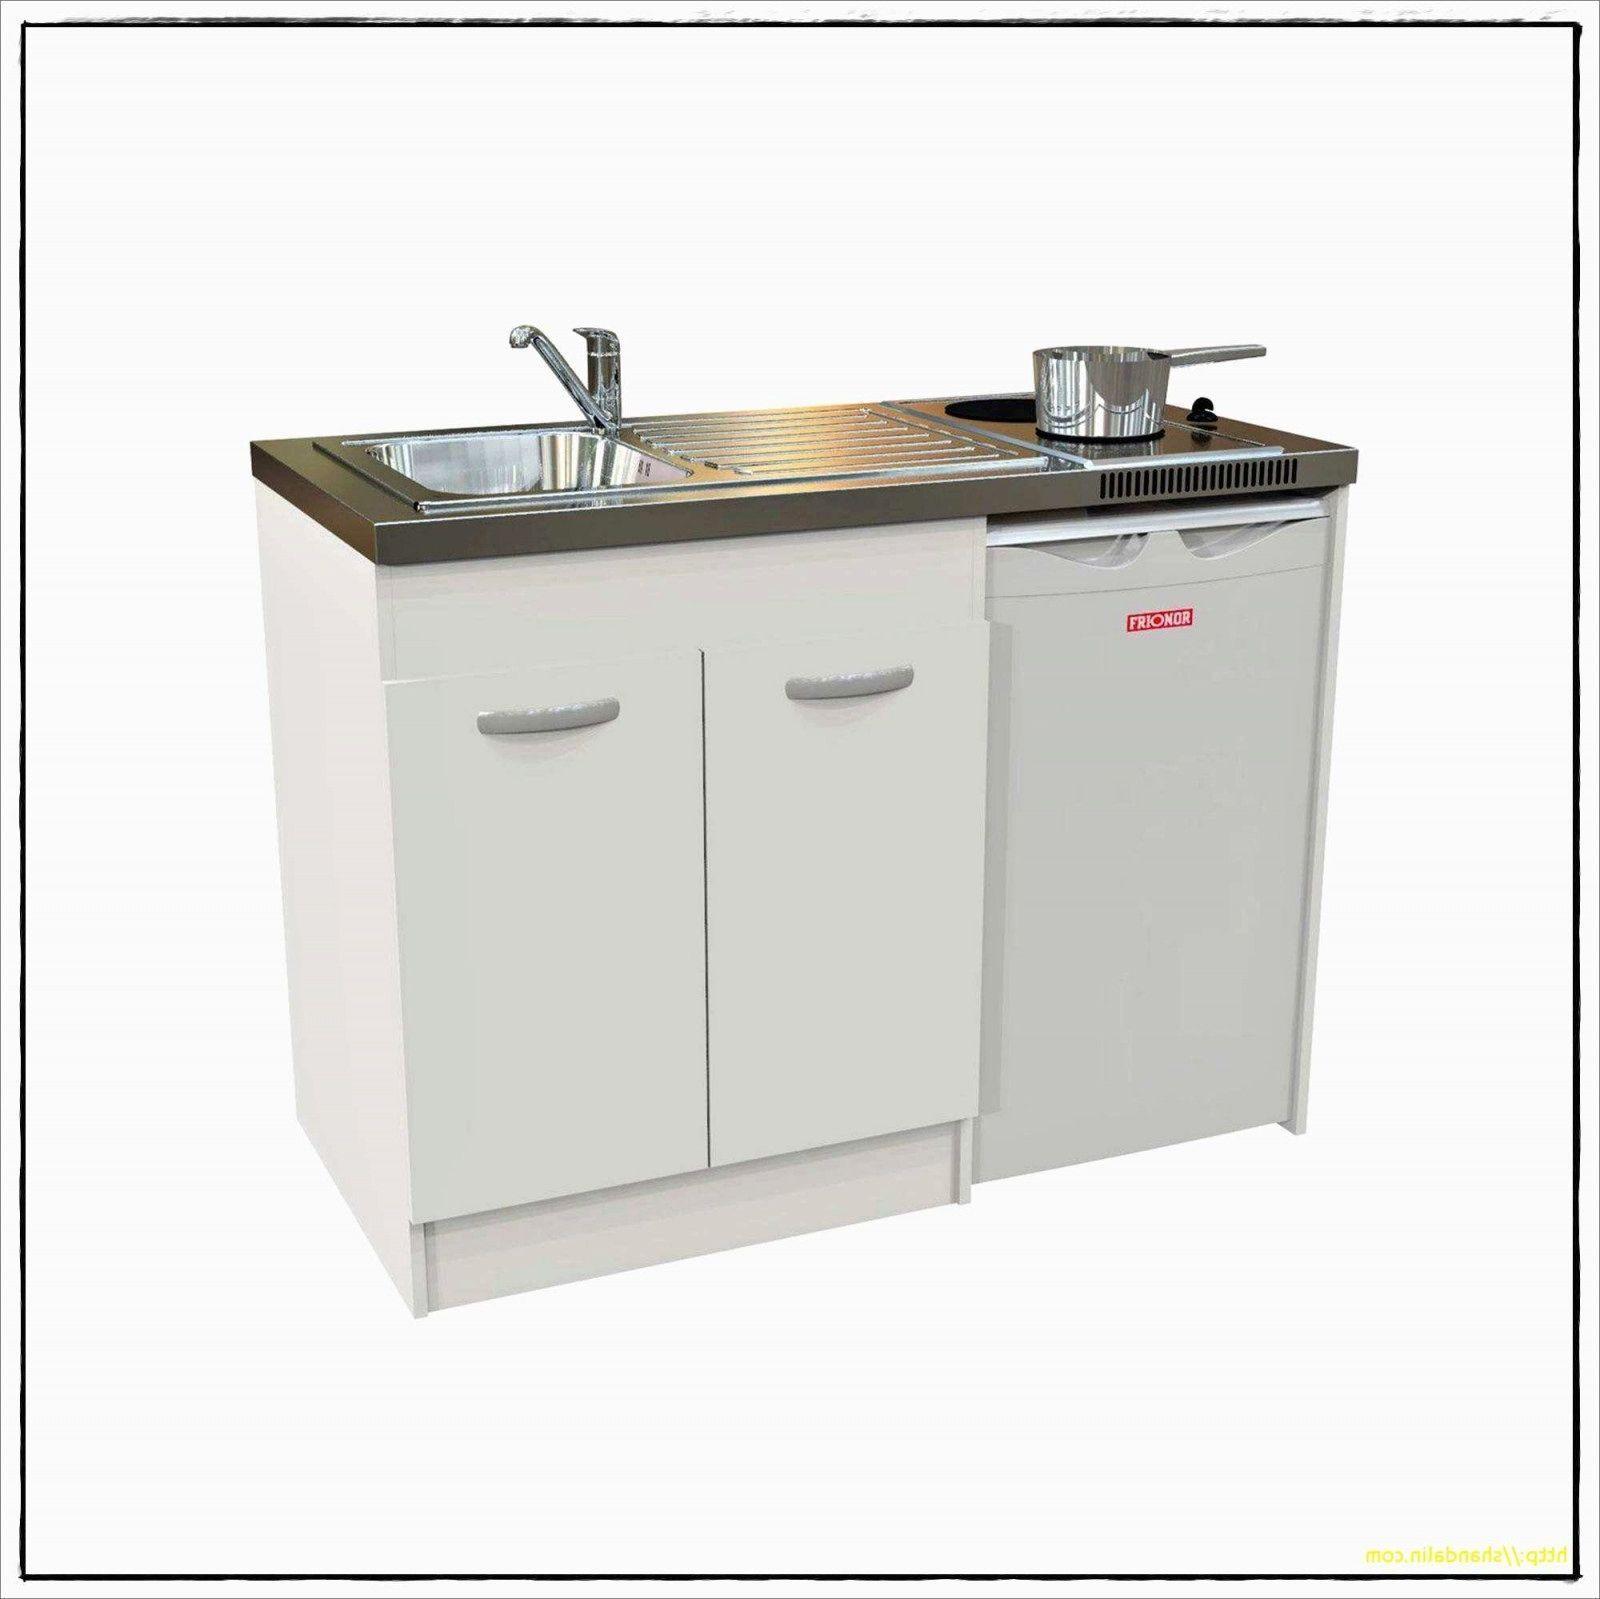 Castorama Check Evier Meuble Sier Sous Trick Castorama Sink Furniture Under Trick Castorama Trick Sink Cabinet Chec In 2020 Cabinet Home Appliances Armoire